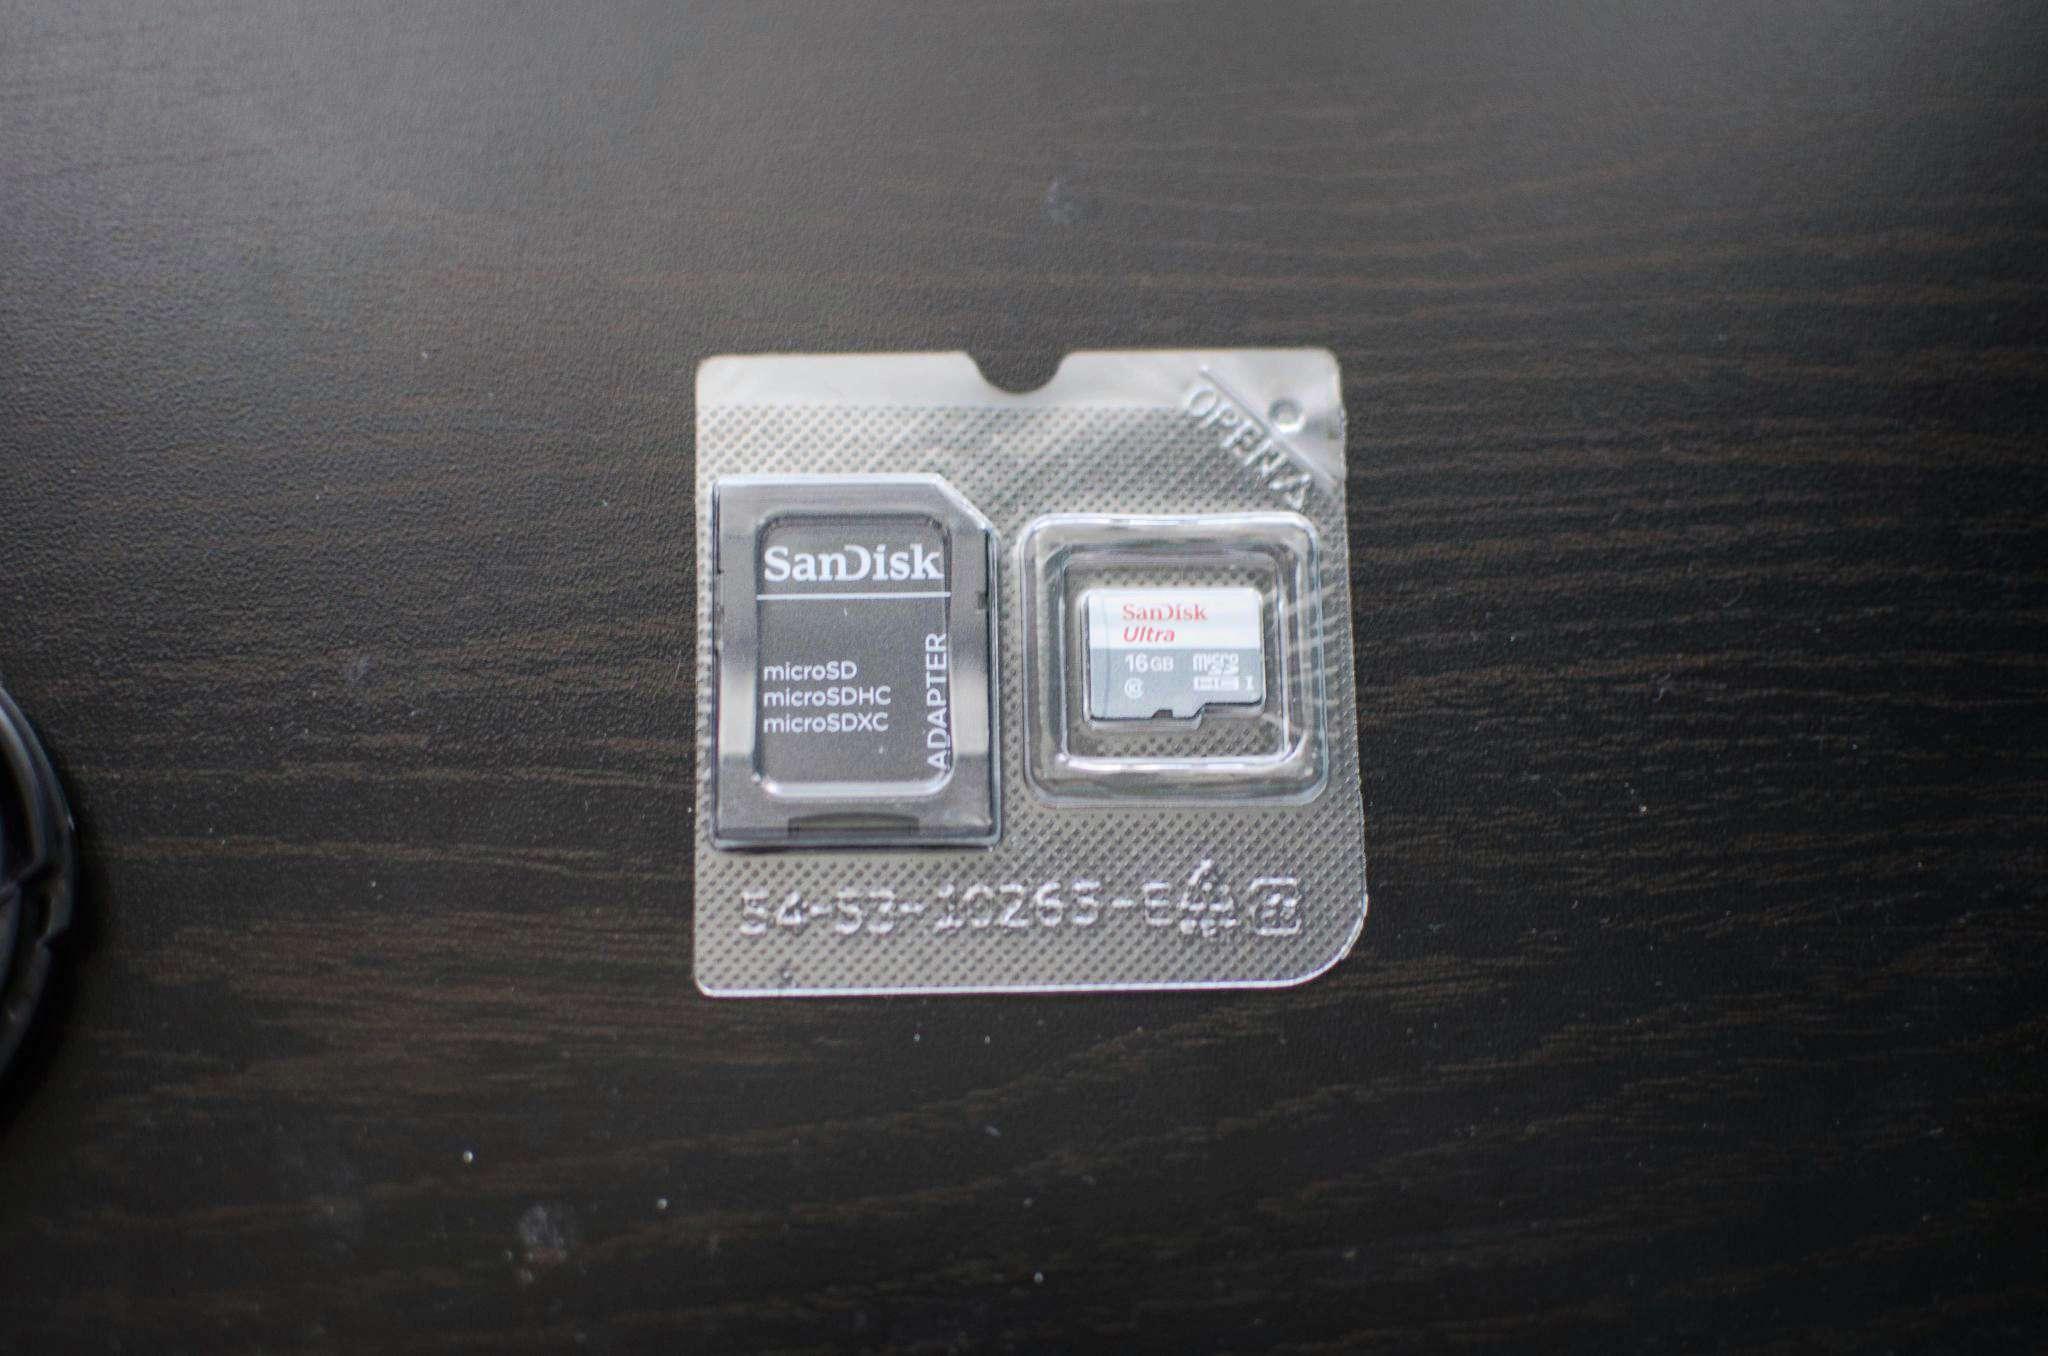 Sandisk Ultra Microsdhc 16gb Class 10 Uhs I 48 Mb S Micro Sd New 1 Sdsqunb Karta Pamyati Adp 016g Gn3ma 1500913154